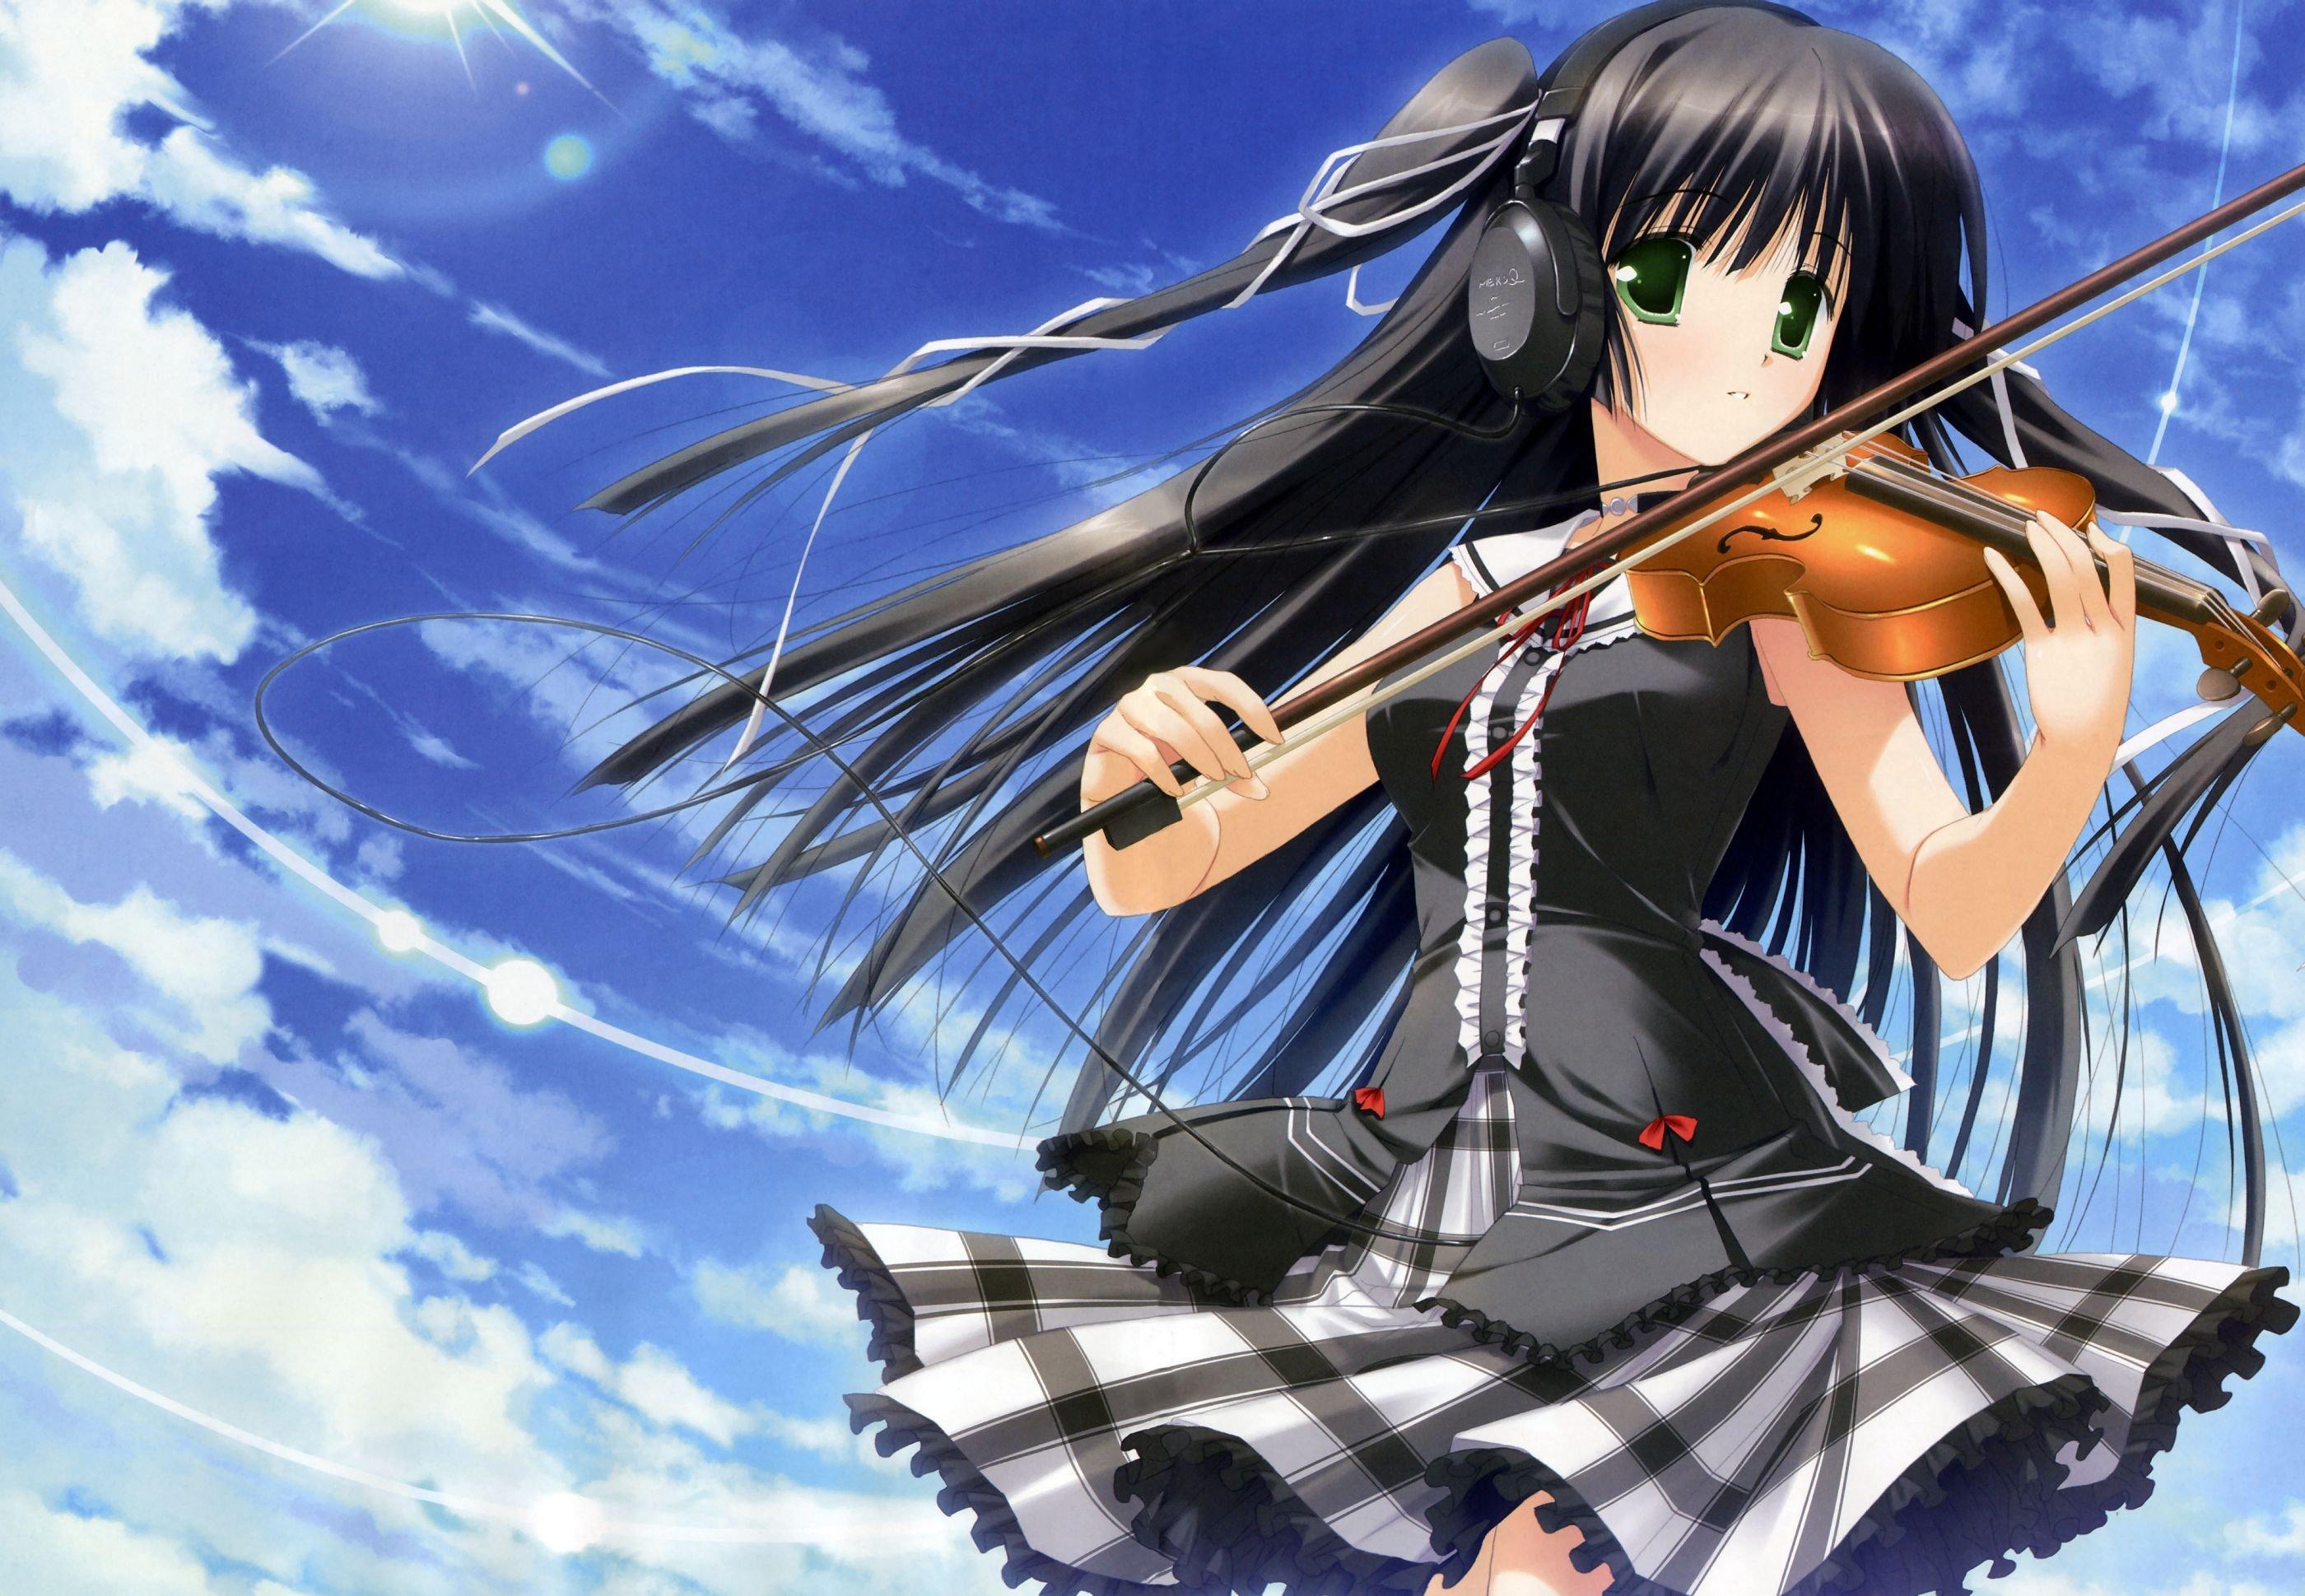 Anime girl form violin headphones sky view wallpaper ...